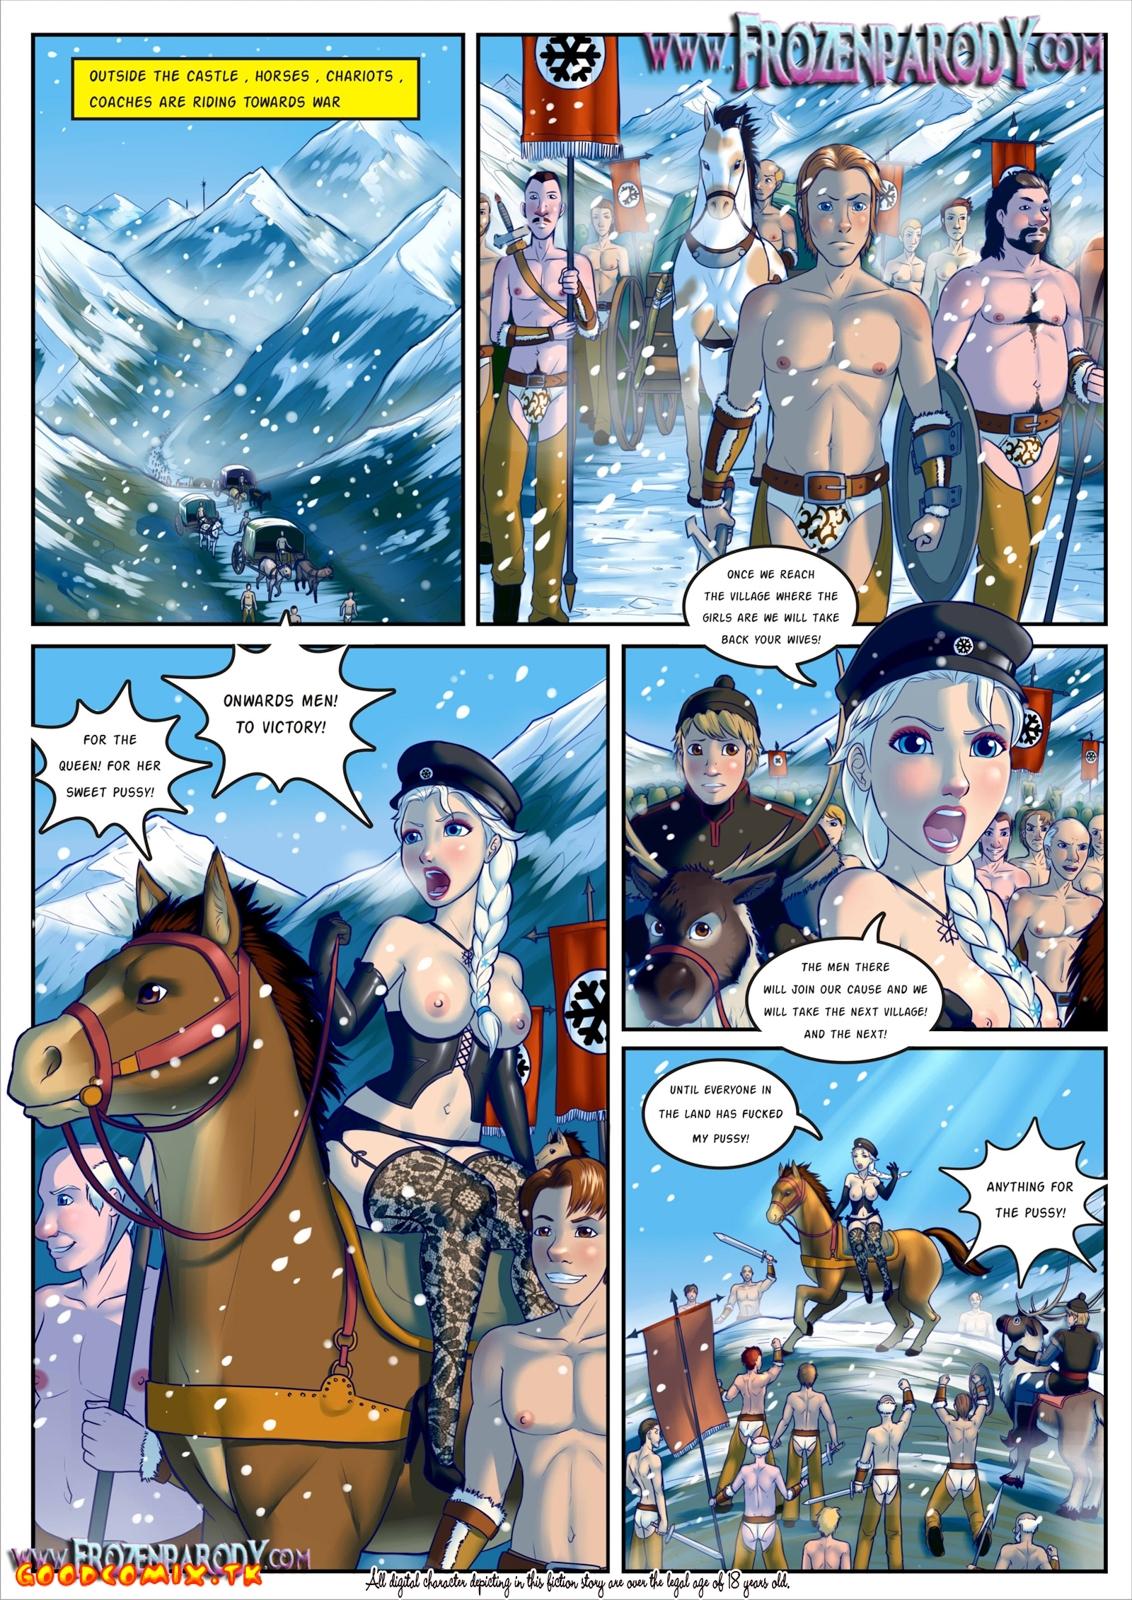 Goodcomix Frozen - [Grimphantom][FrozenParody] - Frozen Parody - Part 2 Anna